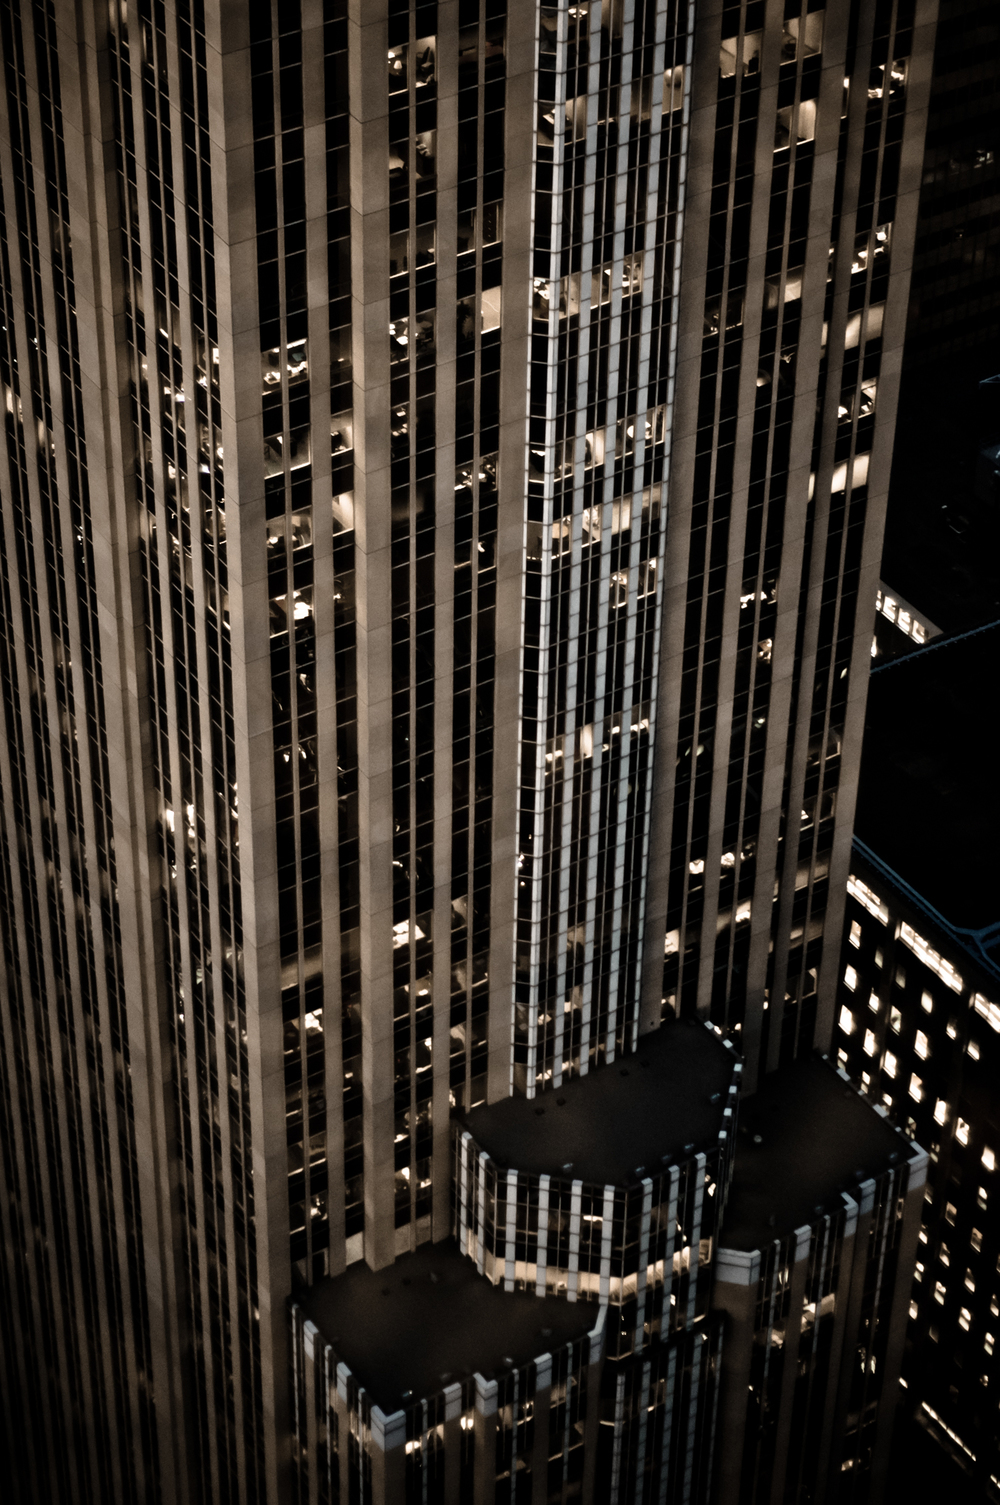 Architecture-Fine-Art-Photography-Jay-Lansford-005.jpg